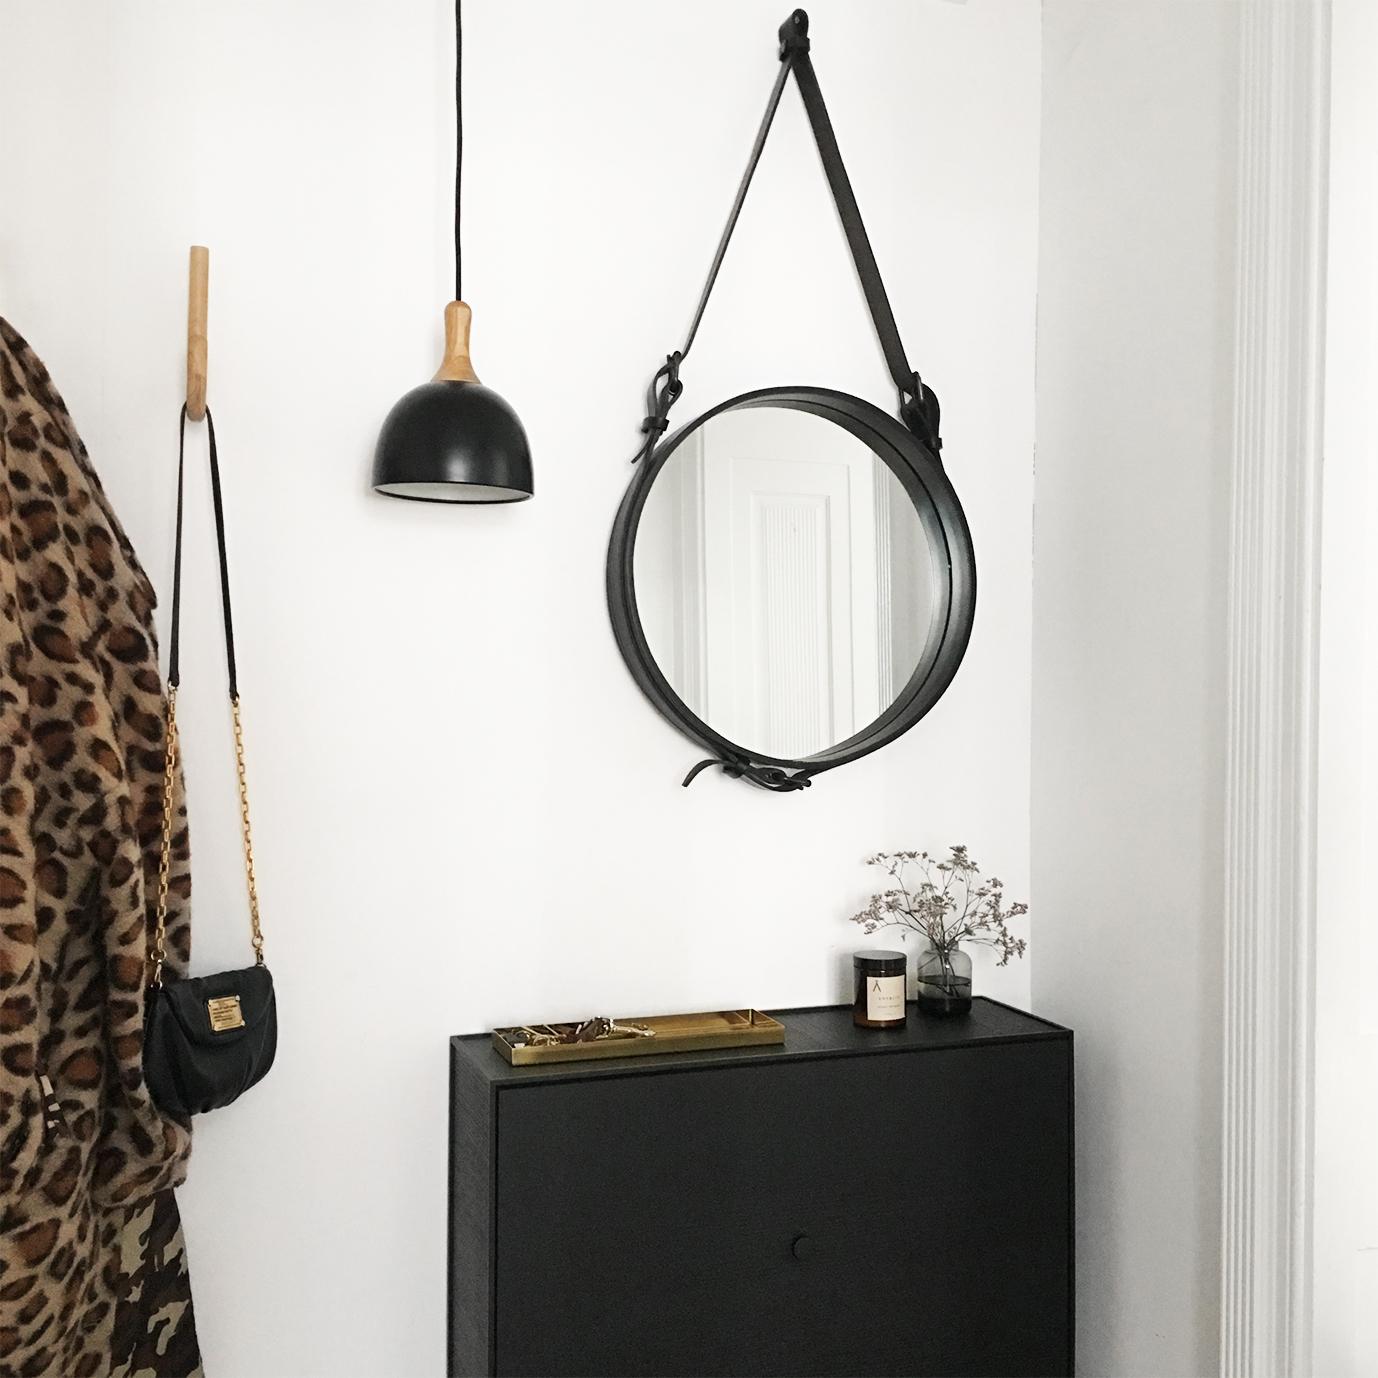 Topp pendant 17.6 cm black matt oak fixture - lifestyle HM 1399.jpg